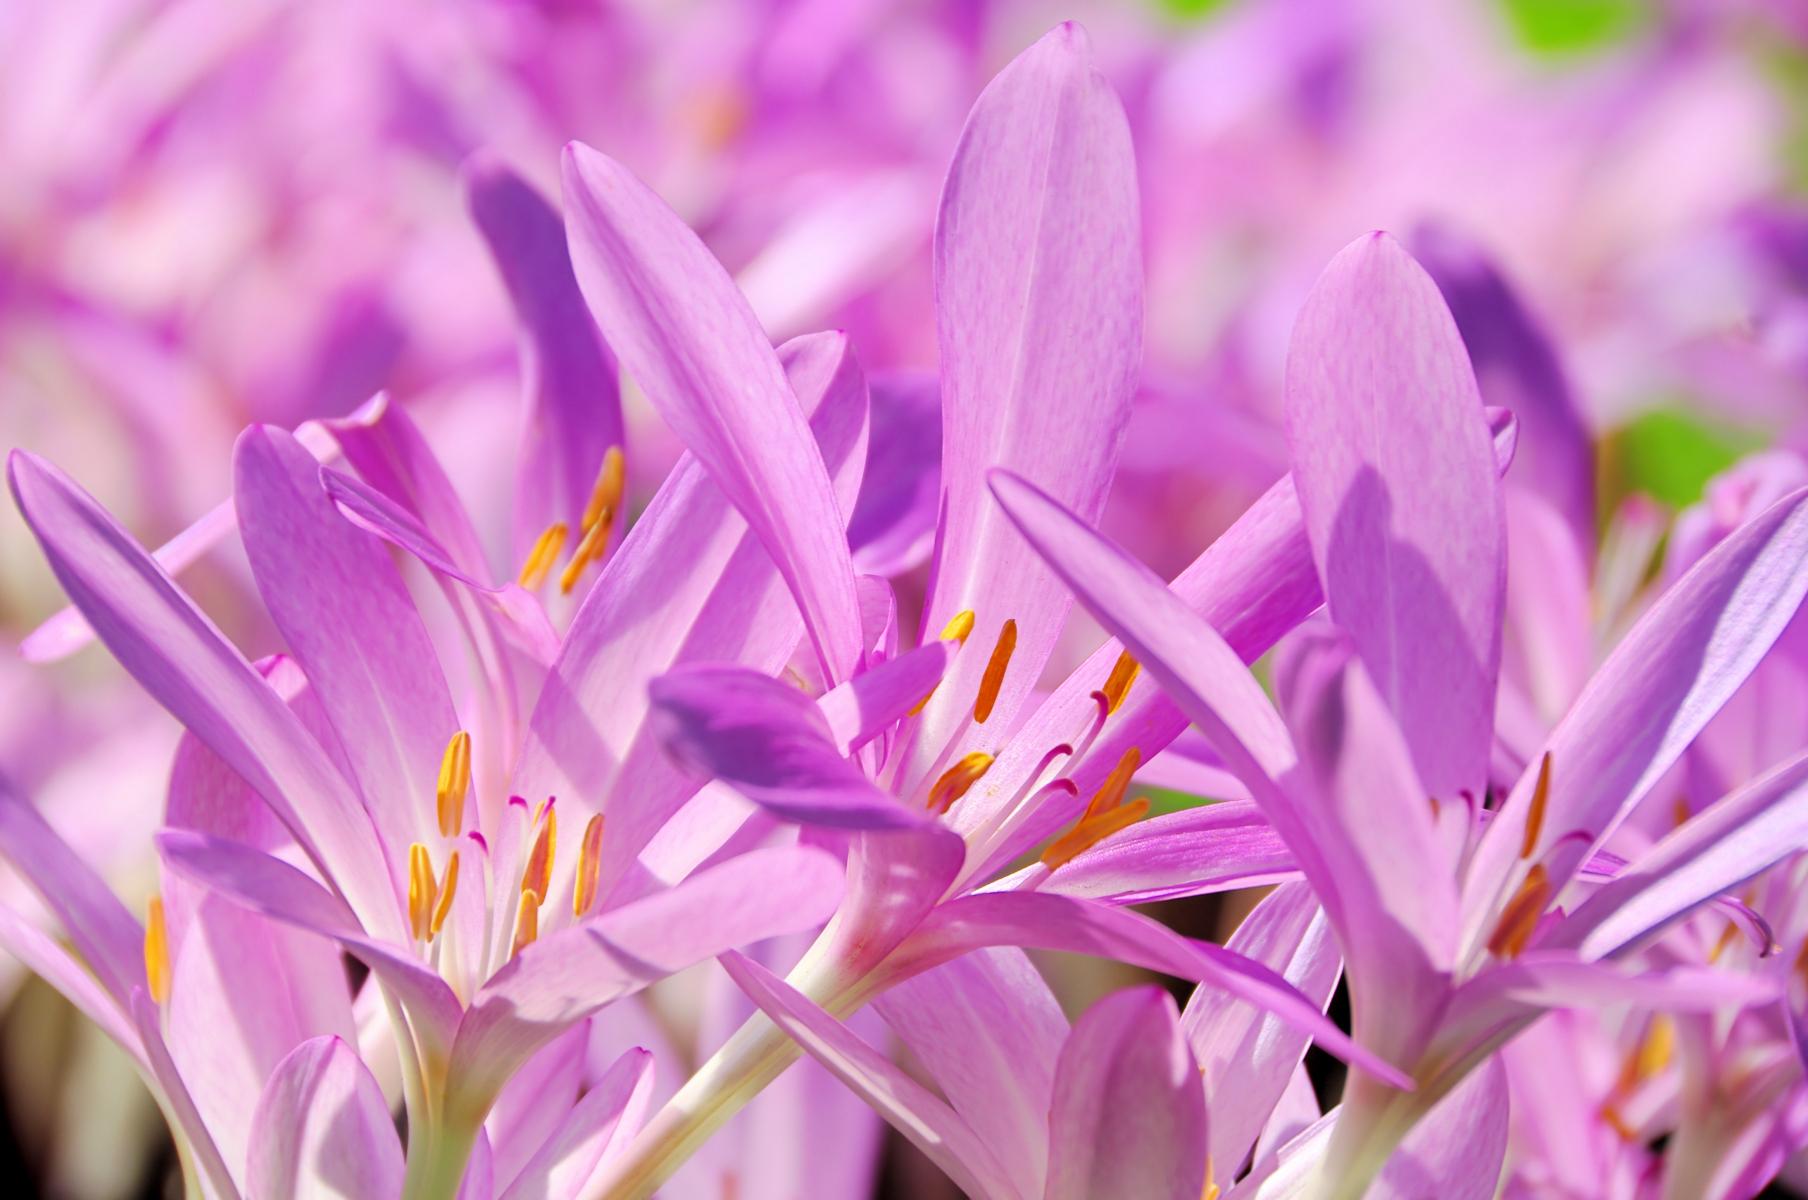 Lyse lilla  eller rosa blomsterblader på en forholdsvis kort stilk som går rett over i blomsten.